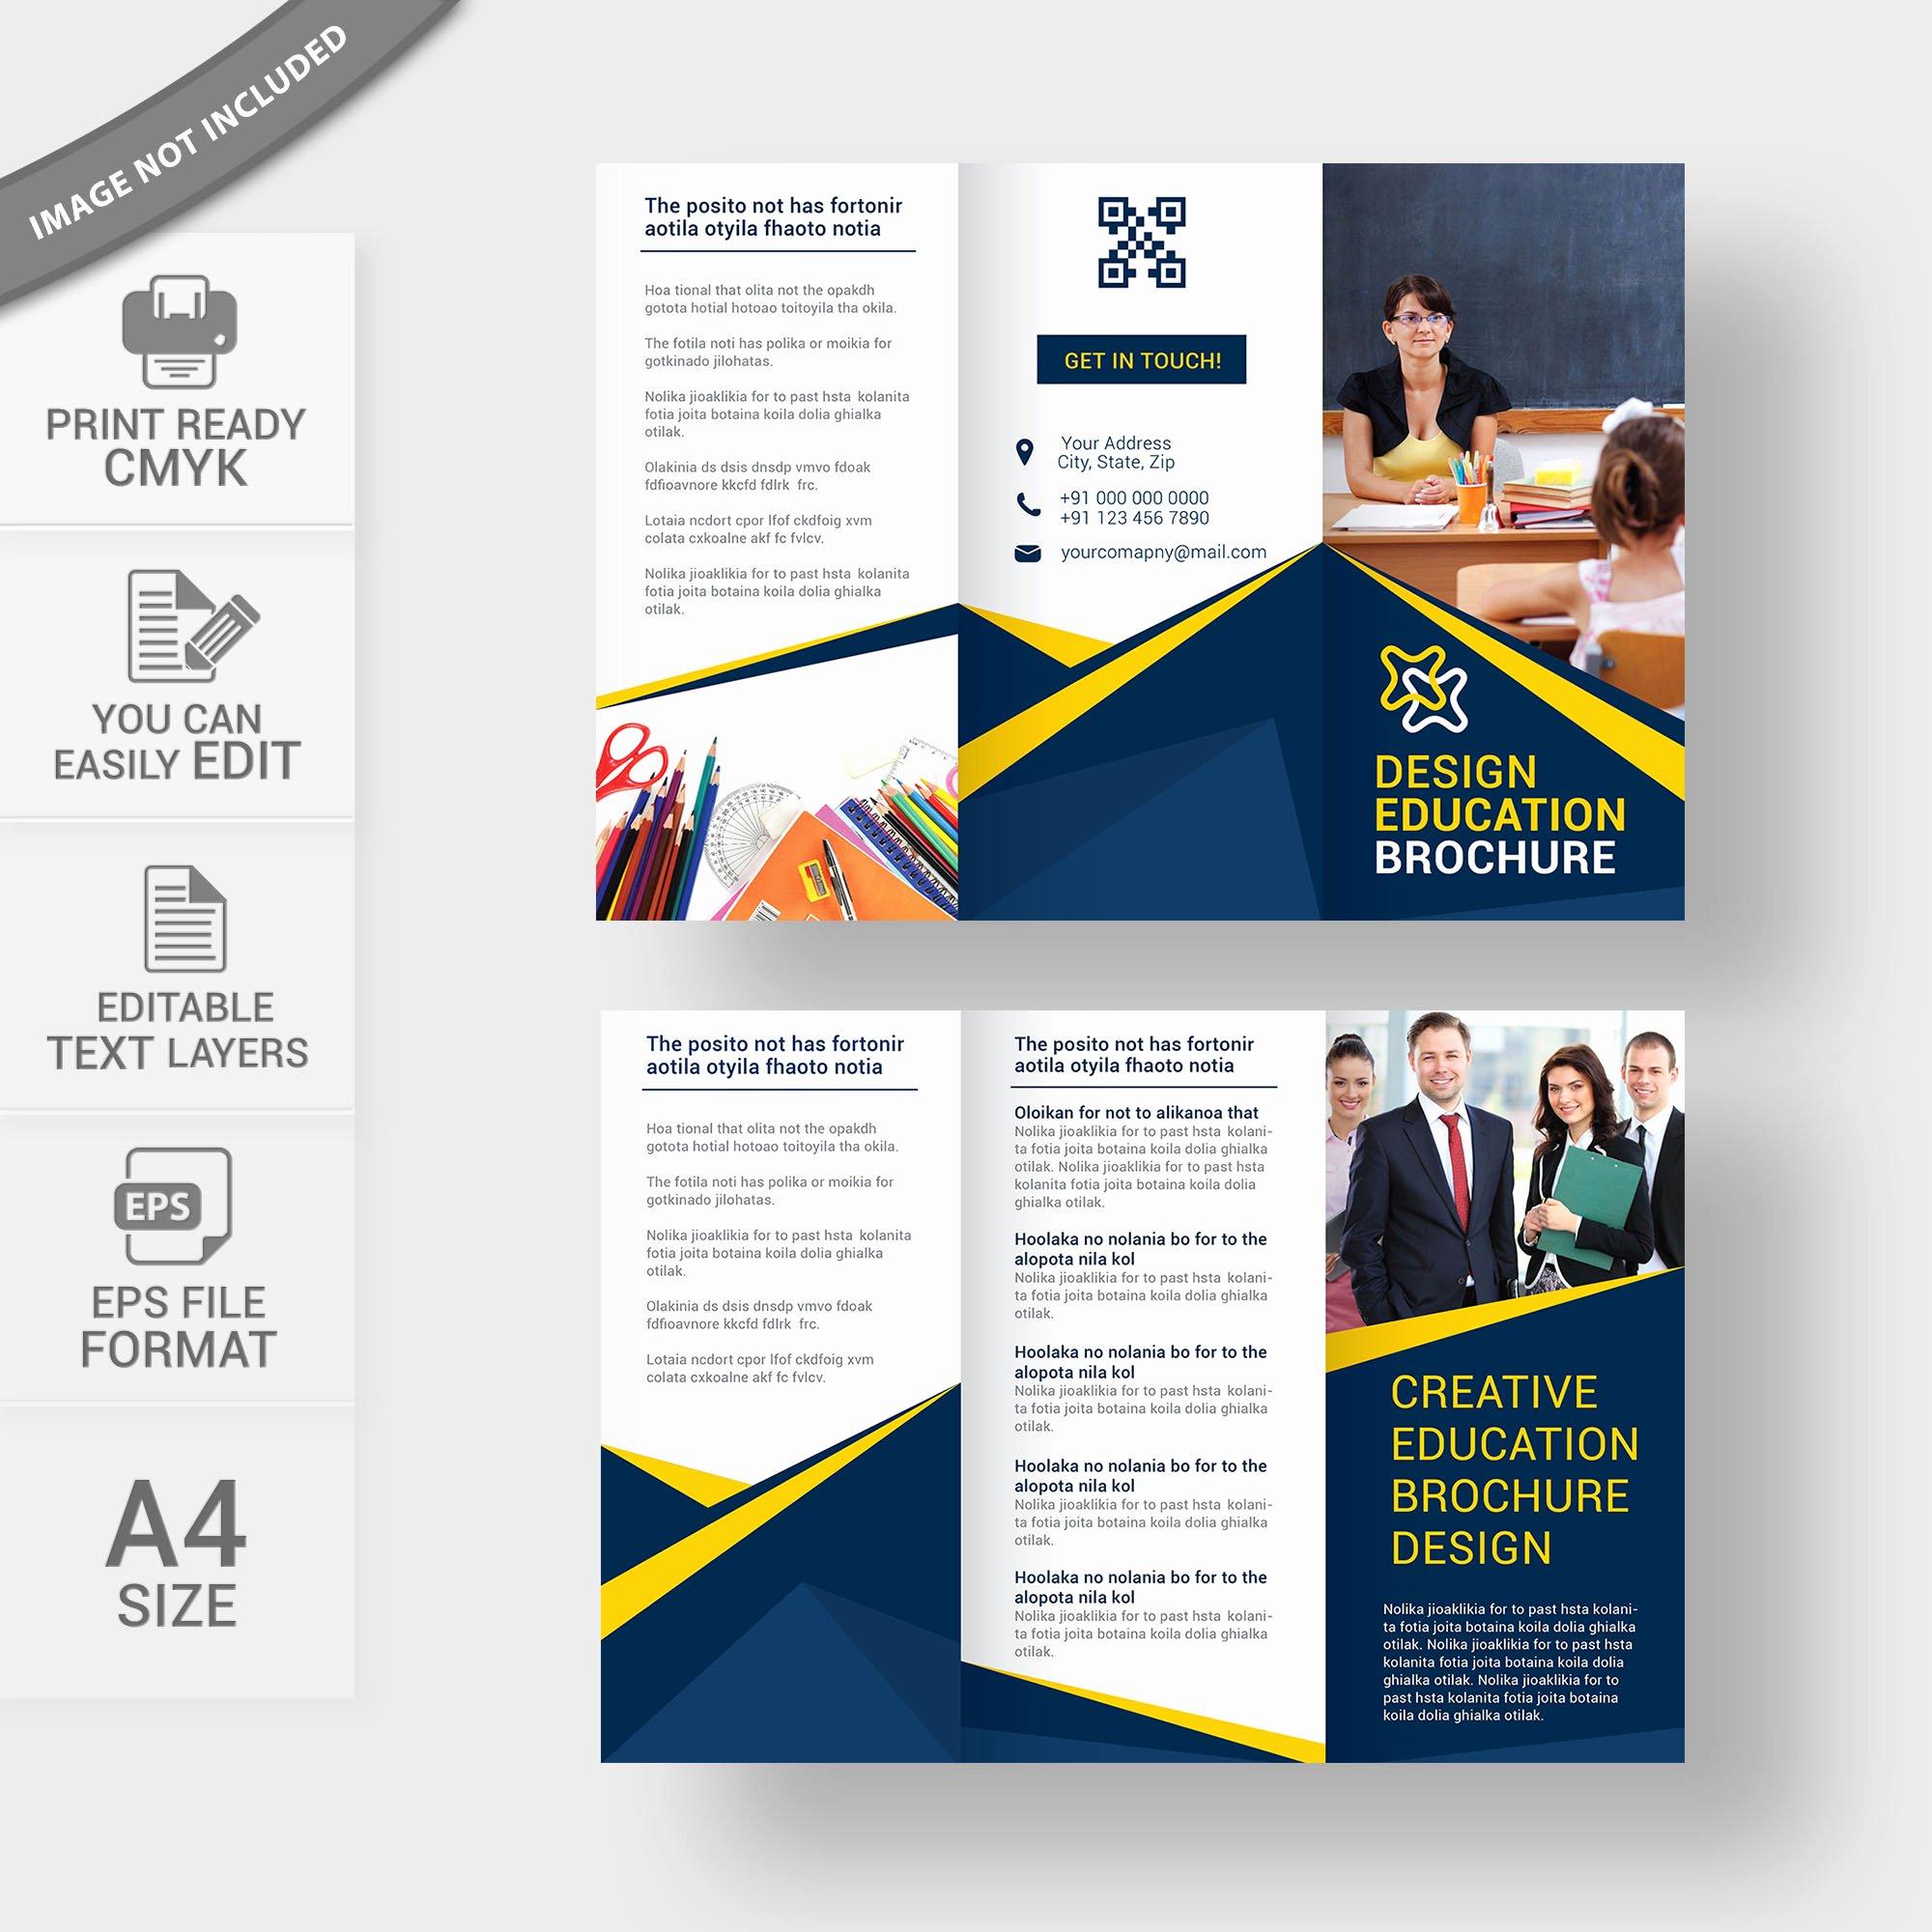 School Brochure Template Free Lovely Education Brochure Template Free Download Vector Wisxi